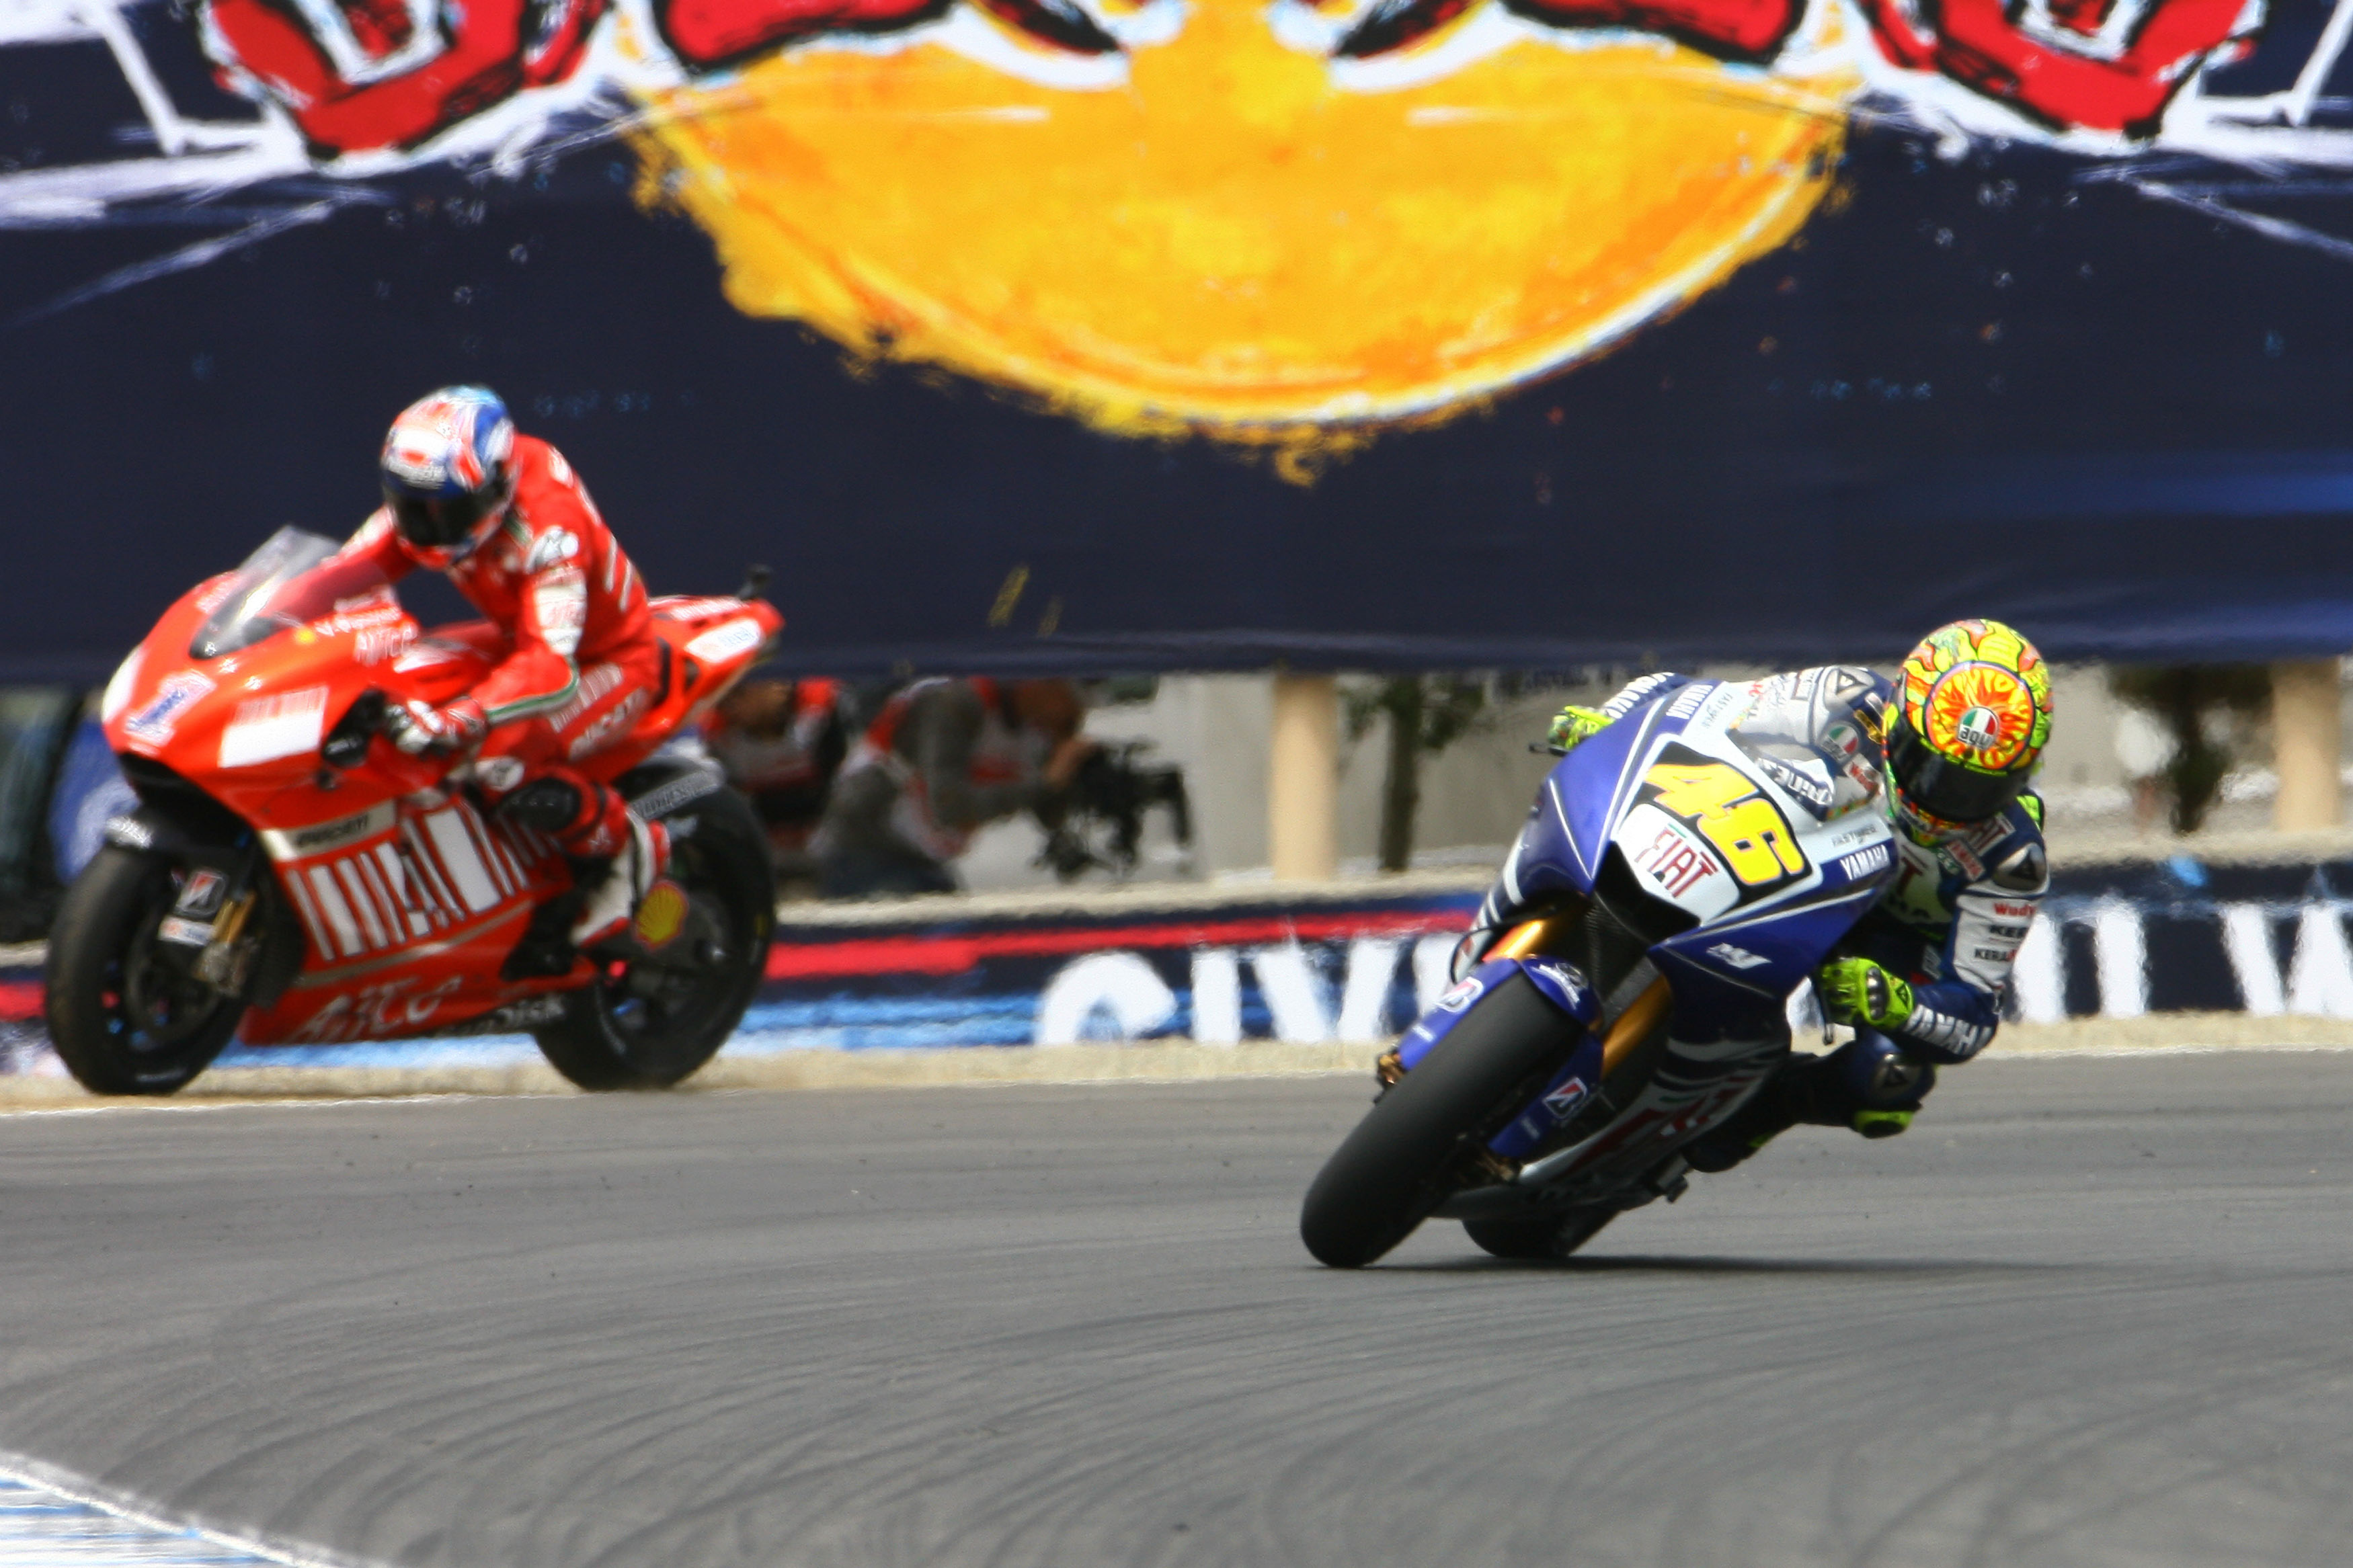 Valentino Rossi Yamaha Casey Stoner Ducati Laguna Seca MotoGP 2008